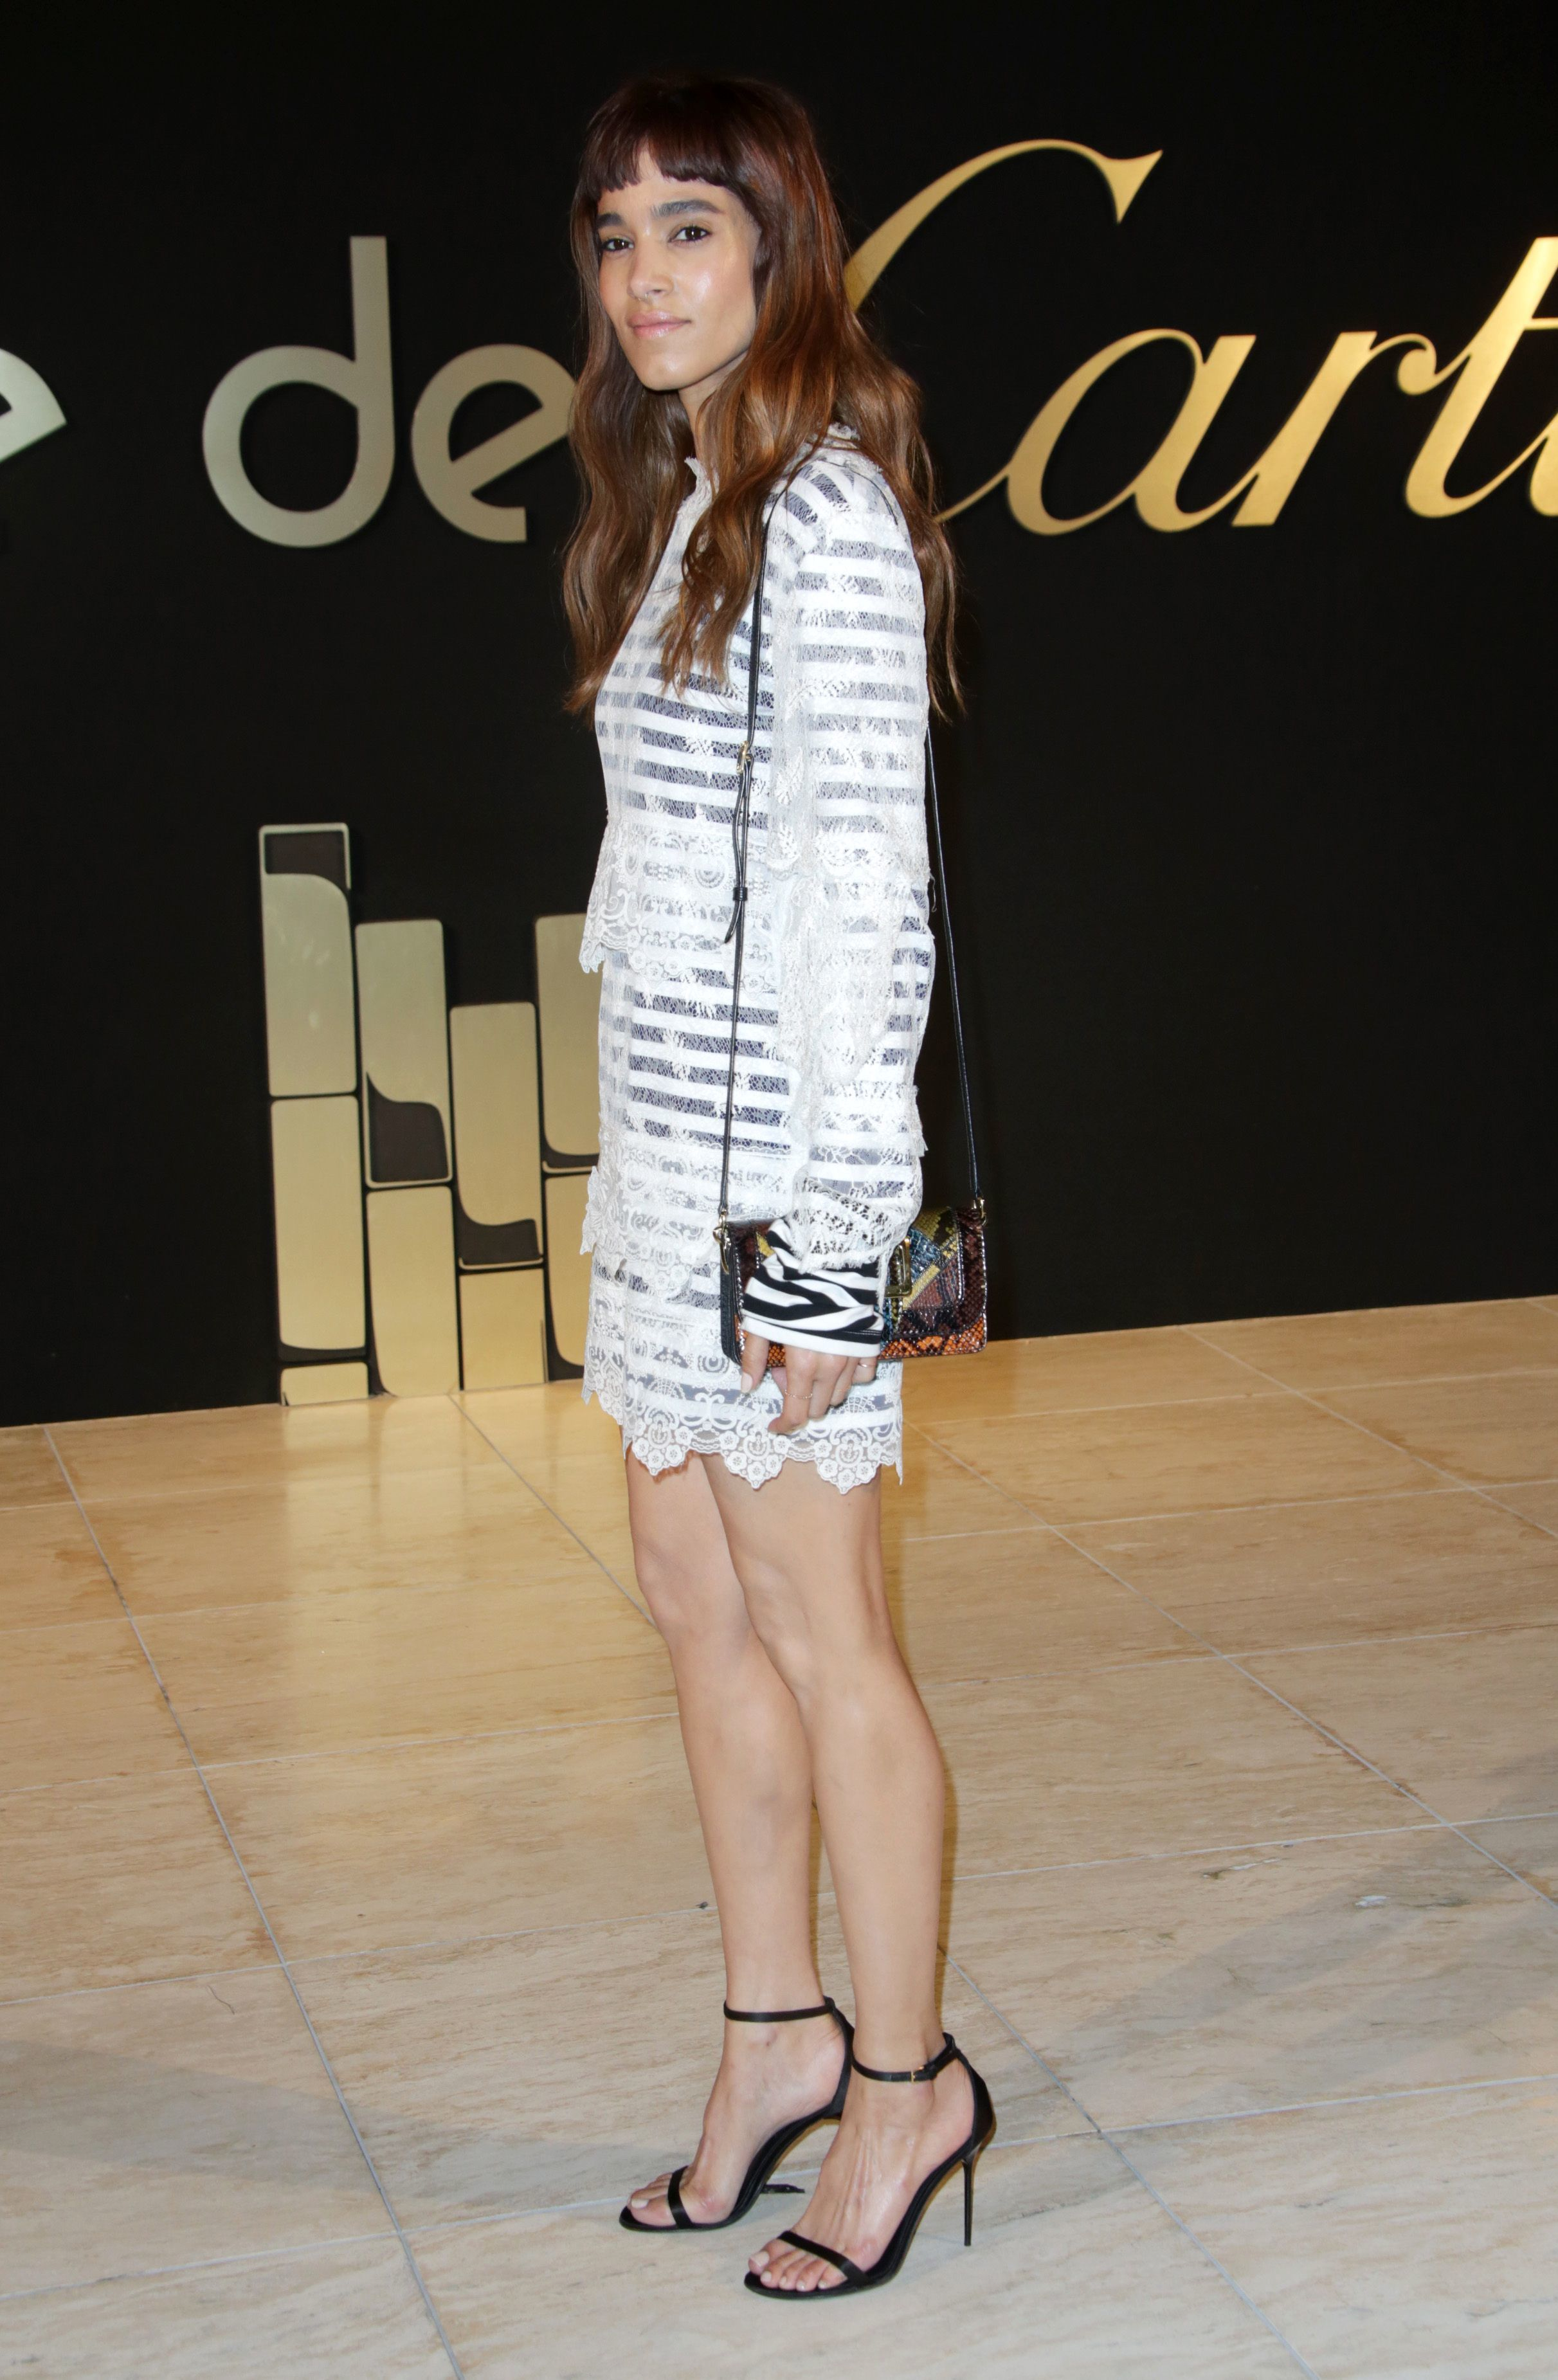 Sofia Boutellas Feet